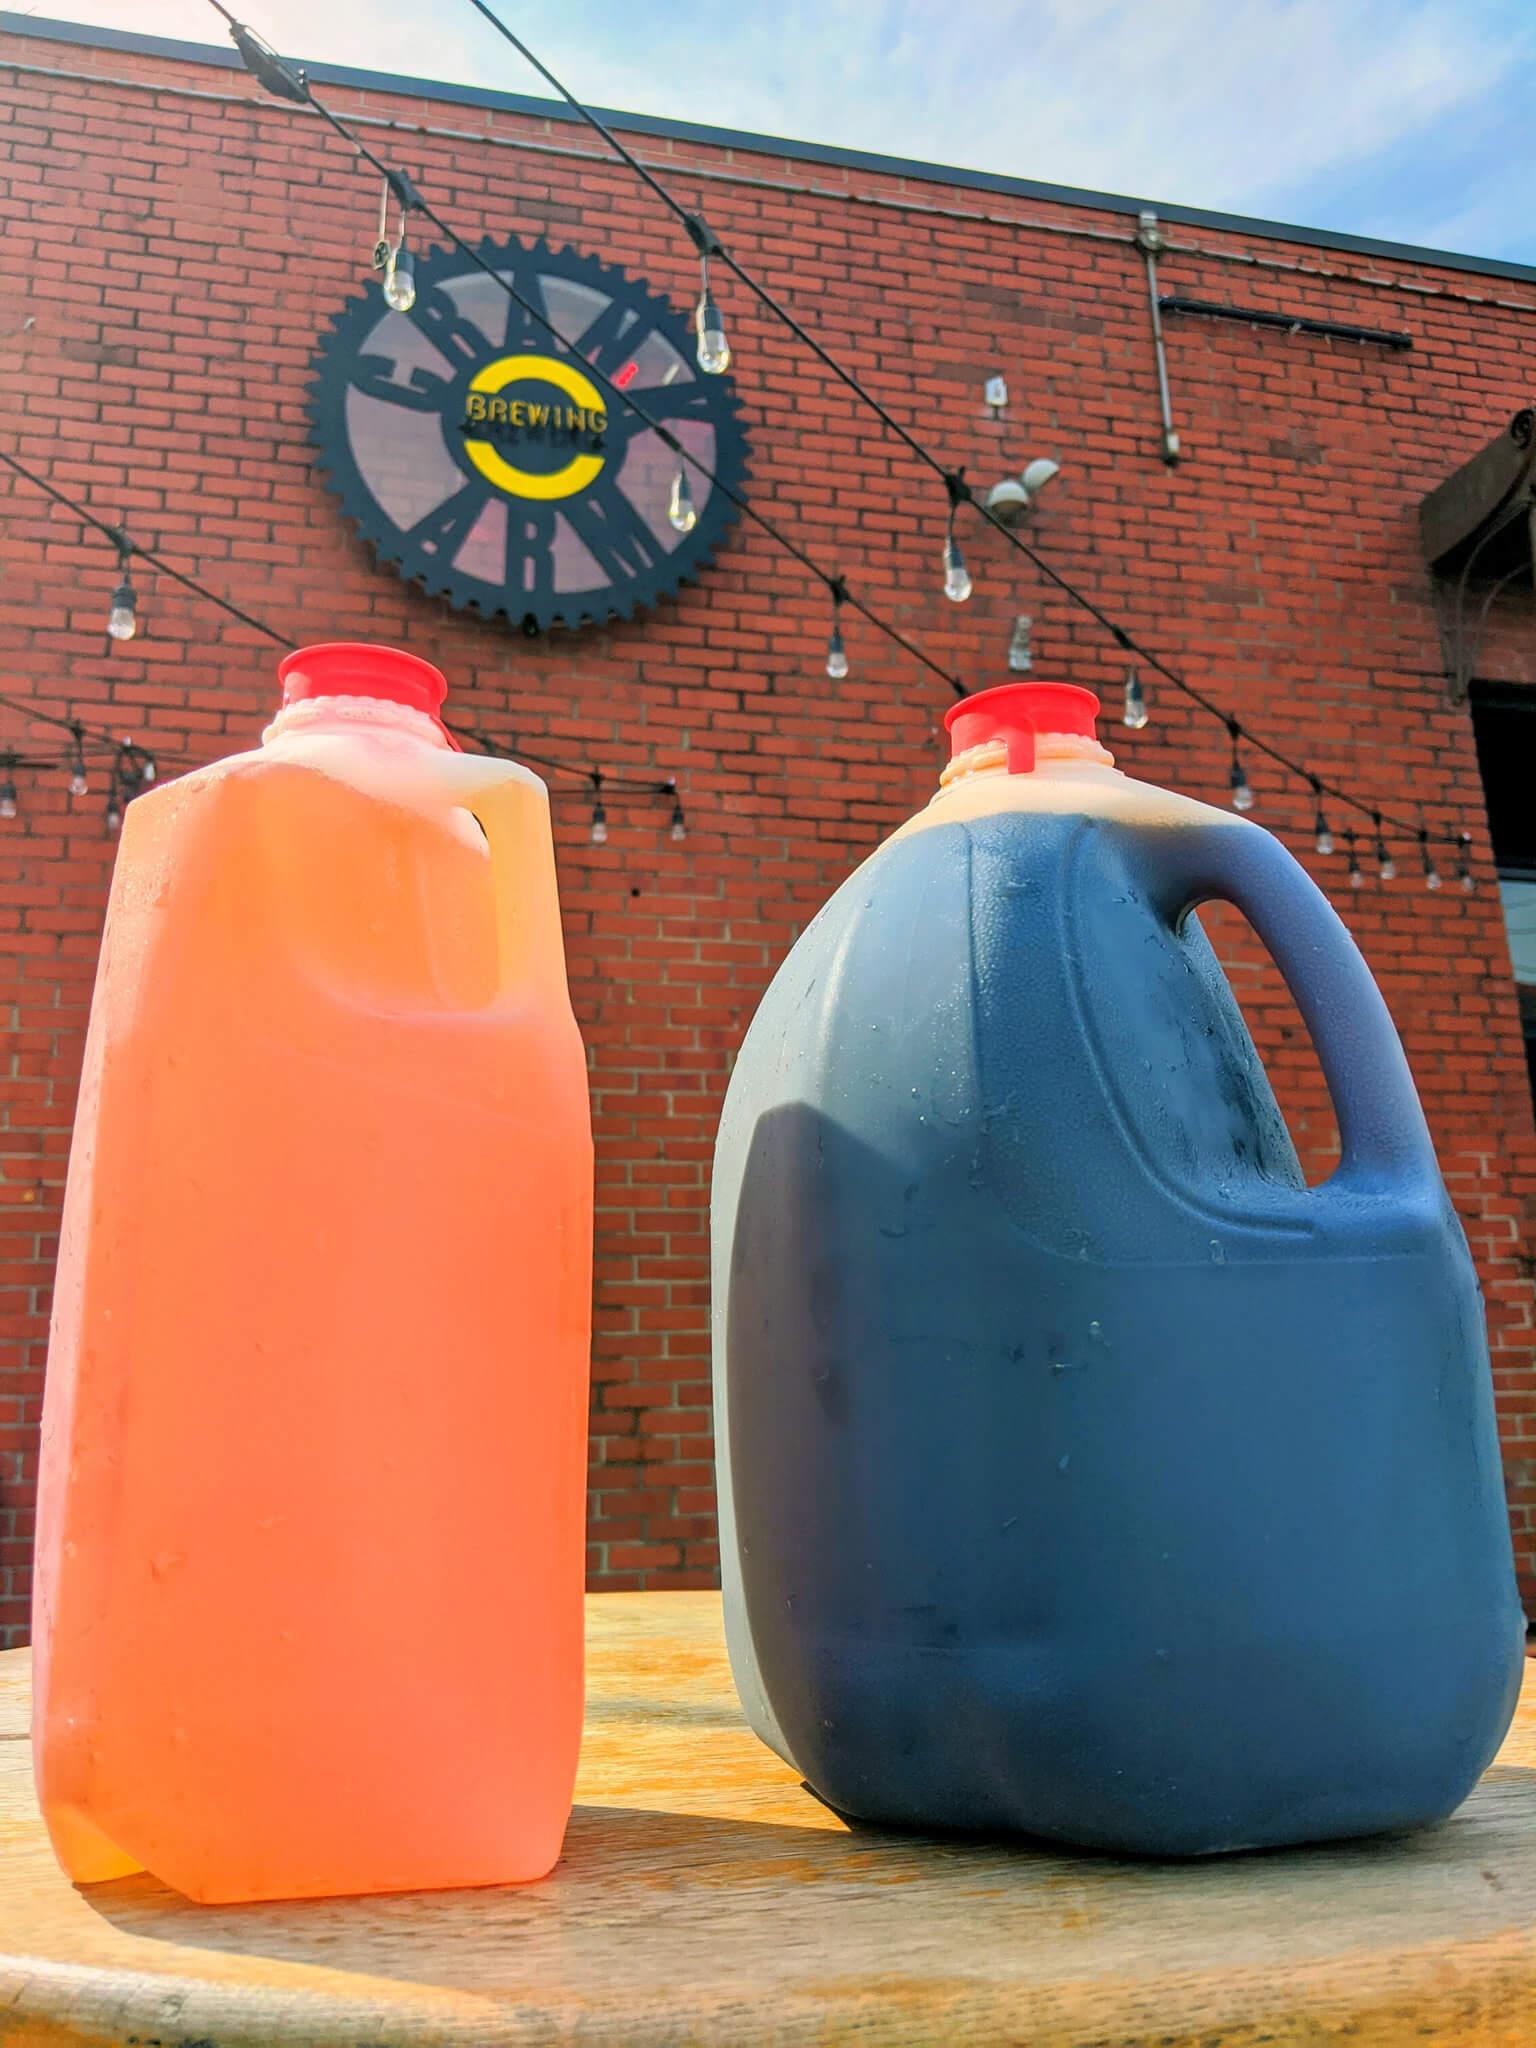 Crank Arm Brewing, in Raleigh, North Carolina, sells its draft beer in plastic milk jugs.